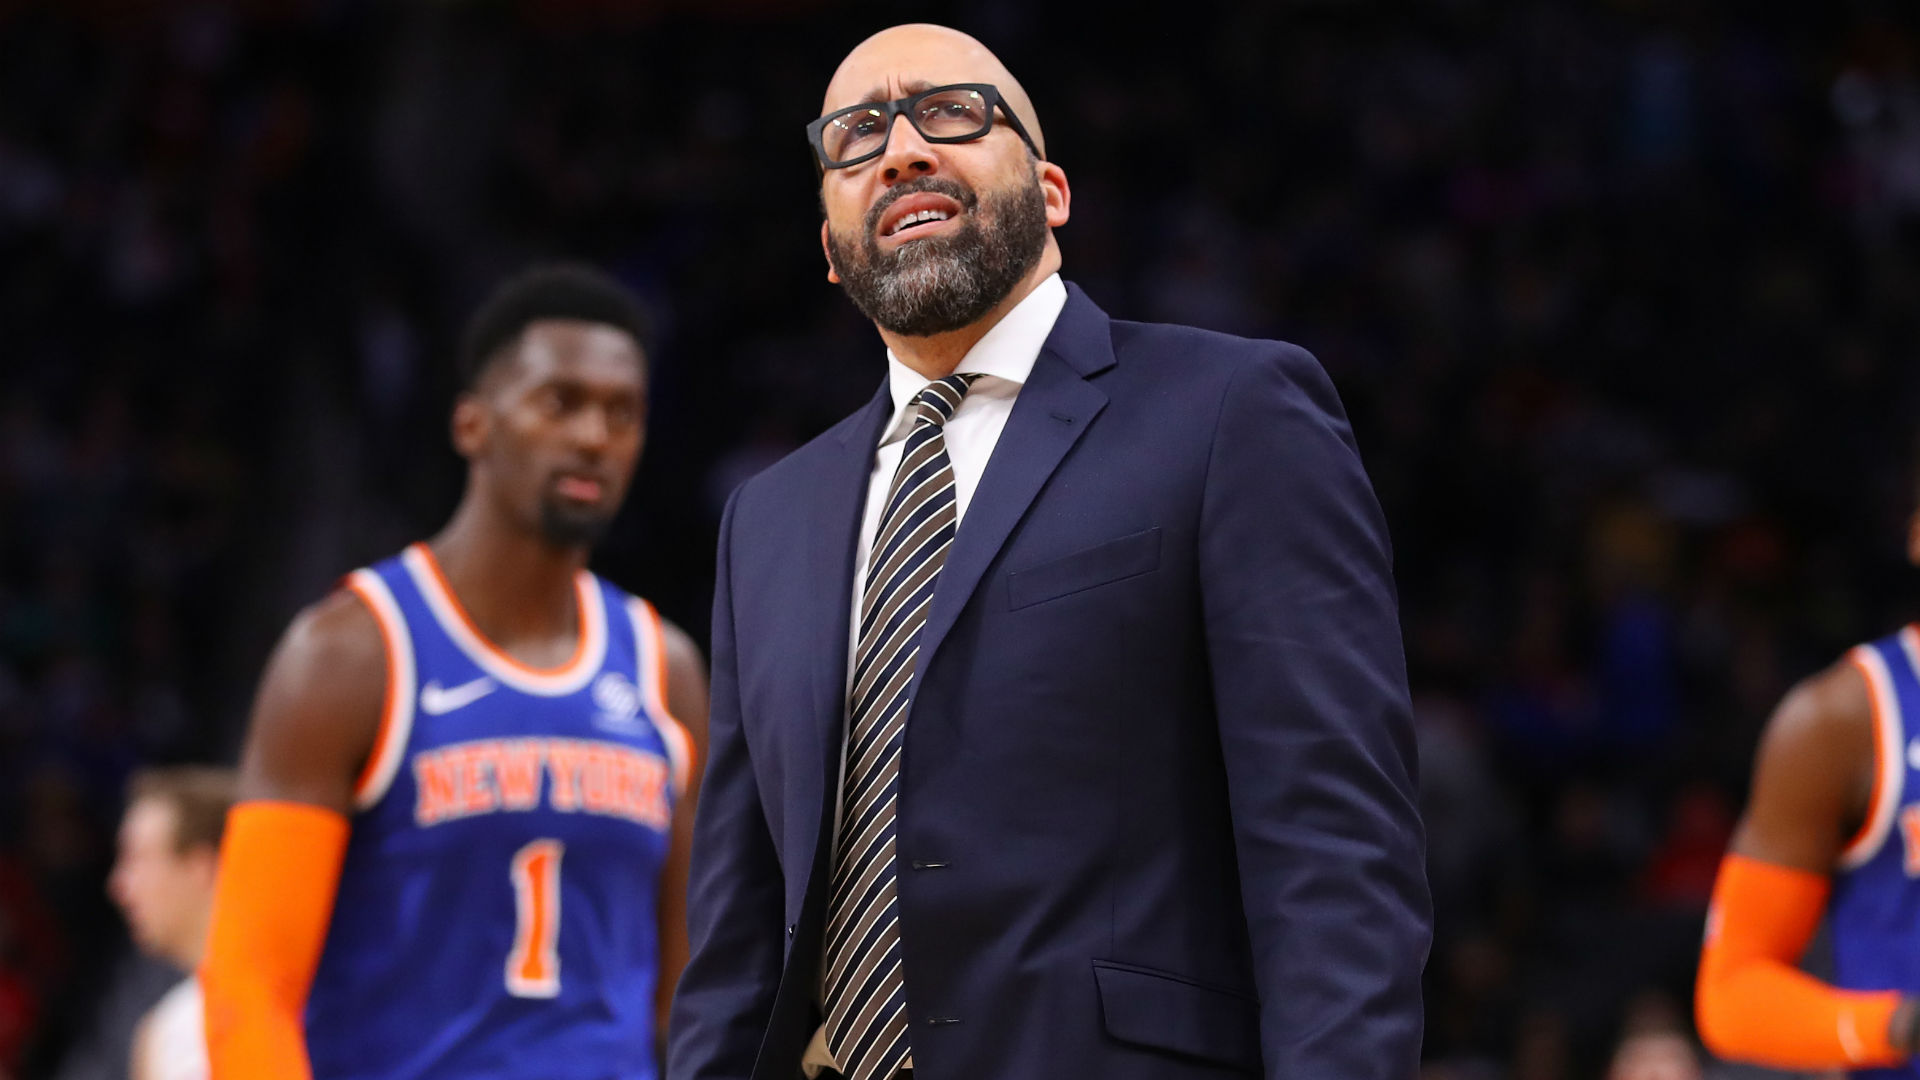 Knicks laying 'groundwork' for firing of David Fizdale; could make run at Toronto's Masai Ujiri, reports say